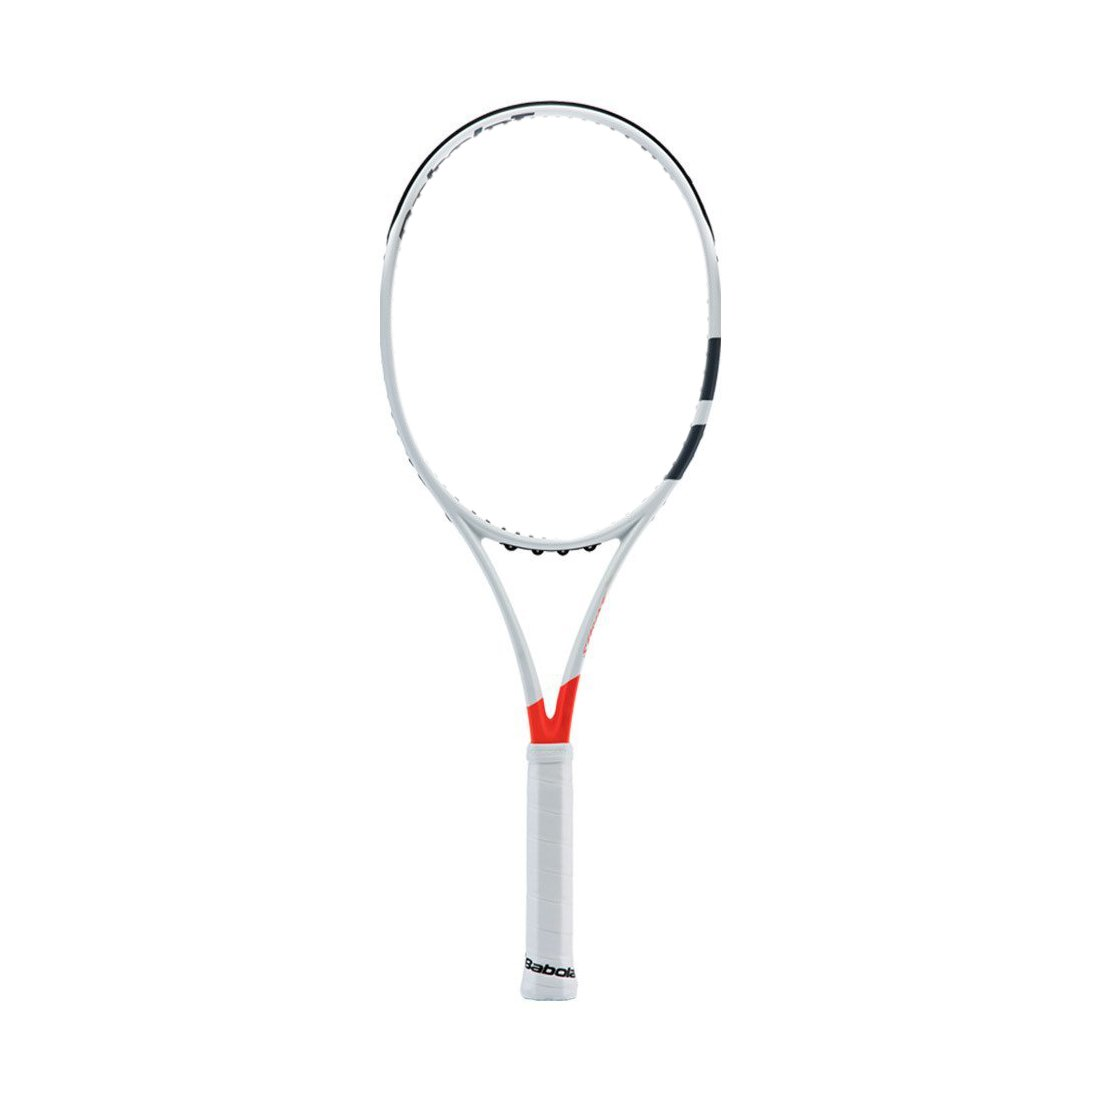 6ea2d0cd2 Amazon.com   Babolat 2017 Pure Strike 16x19 Orange White Tennis Racquet    Sports   Outdoors